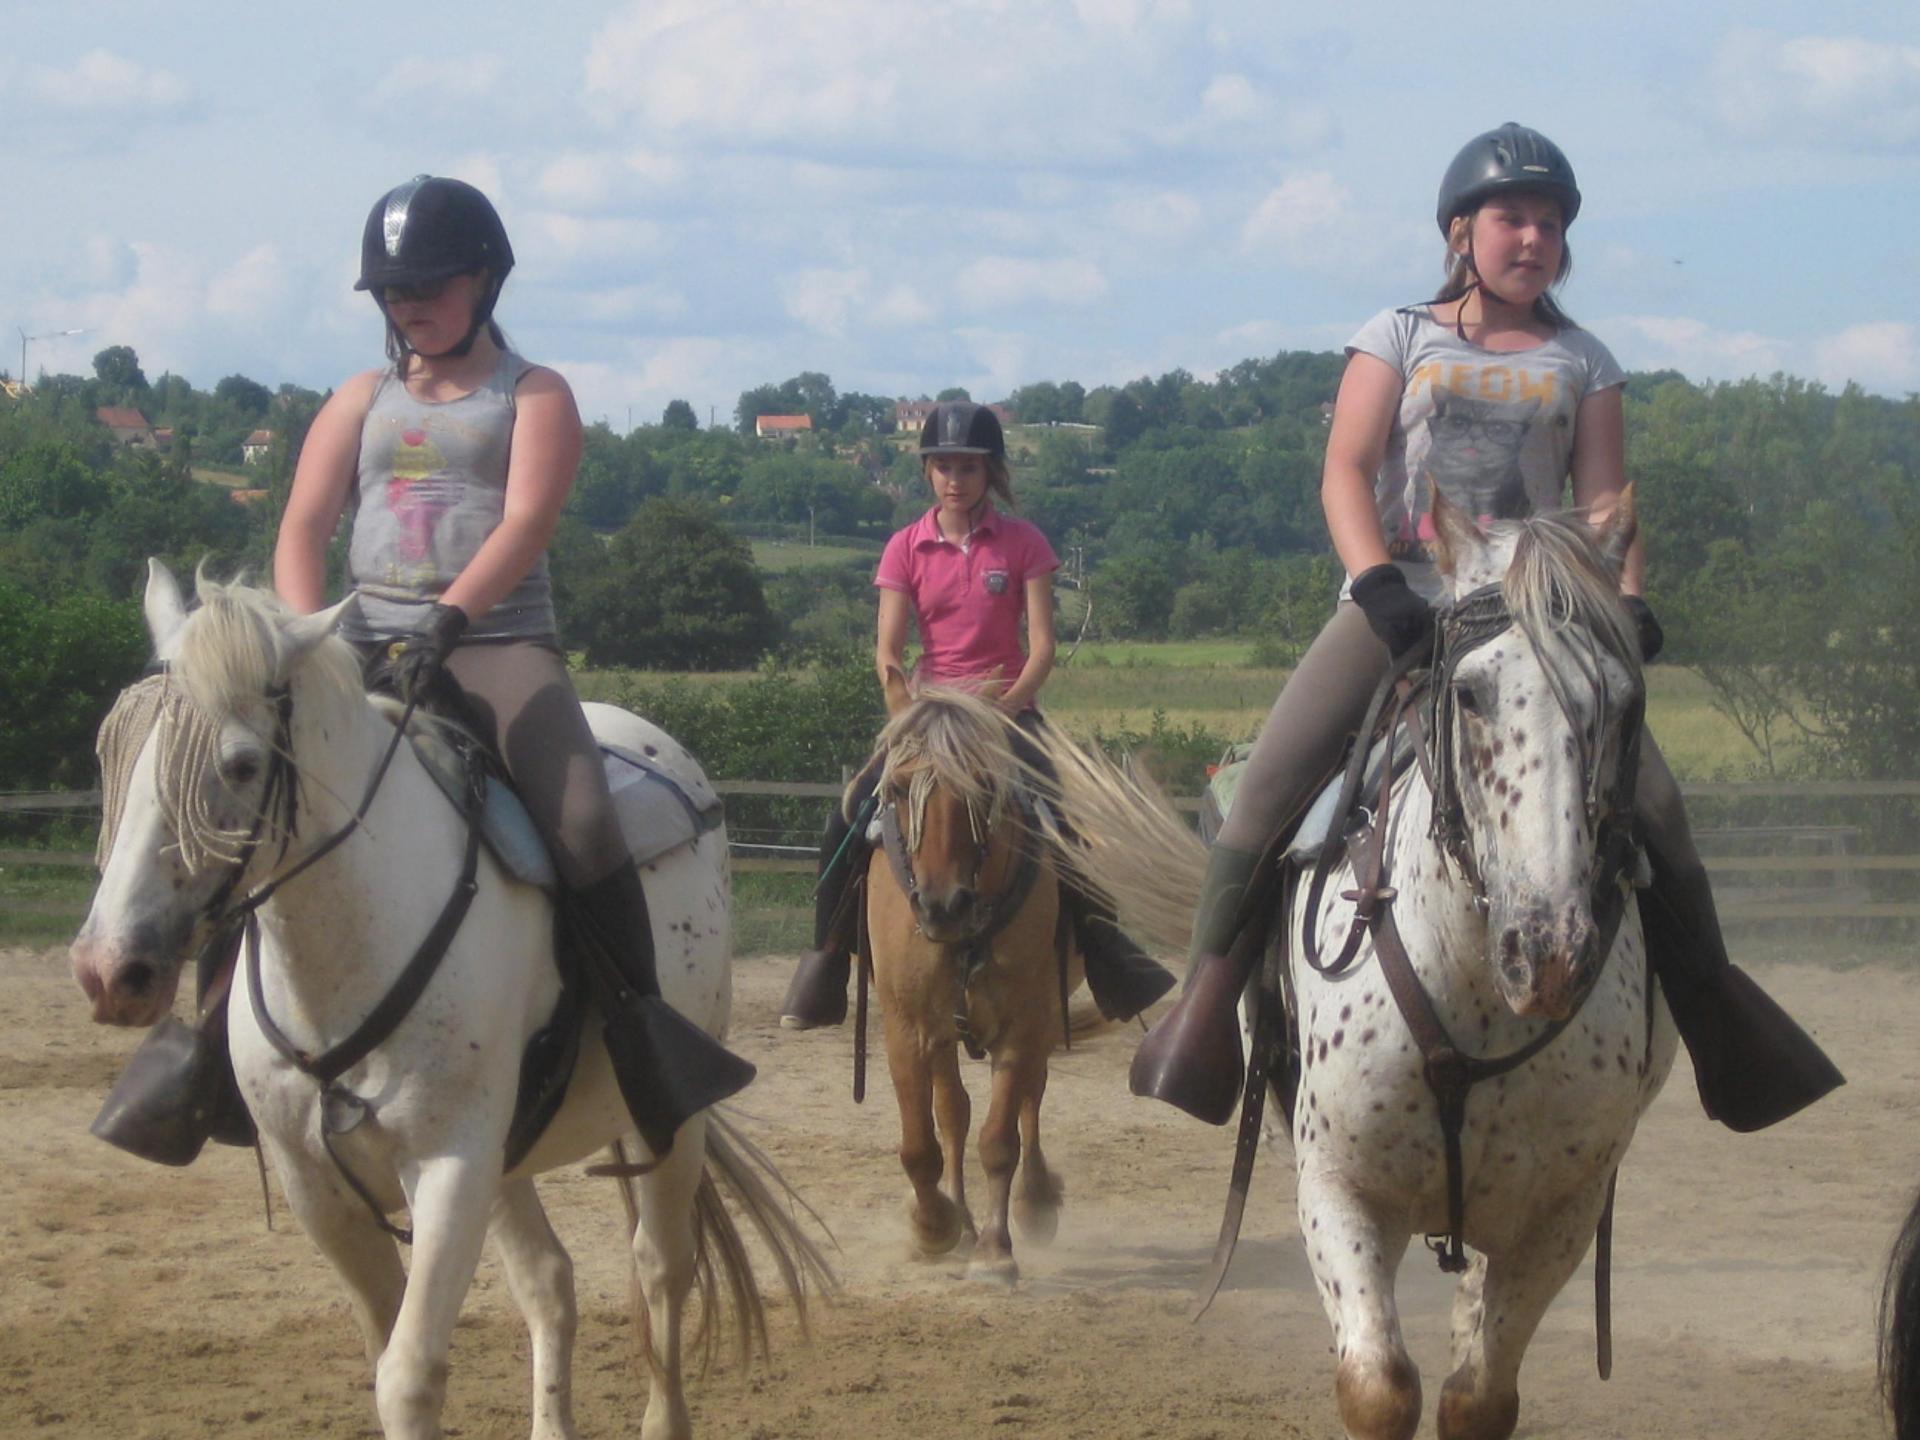 caroussel à cheval